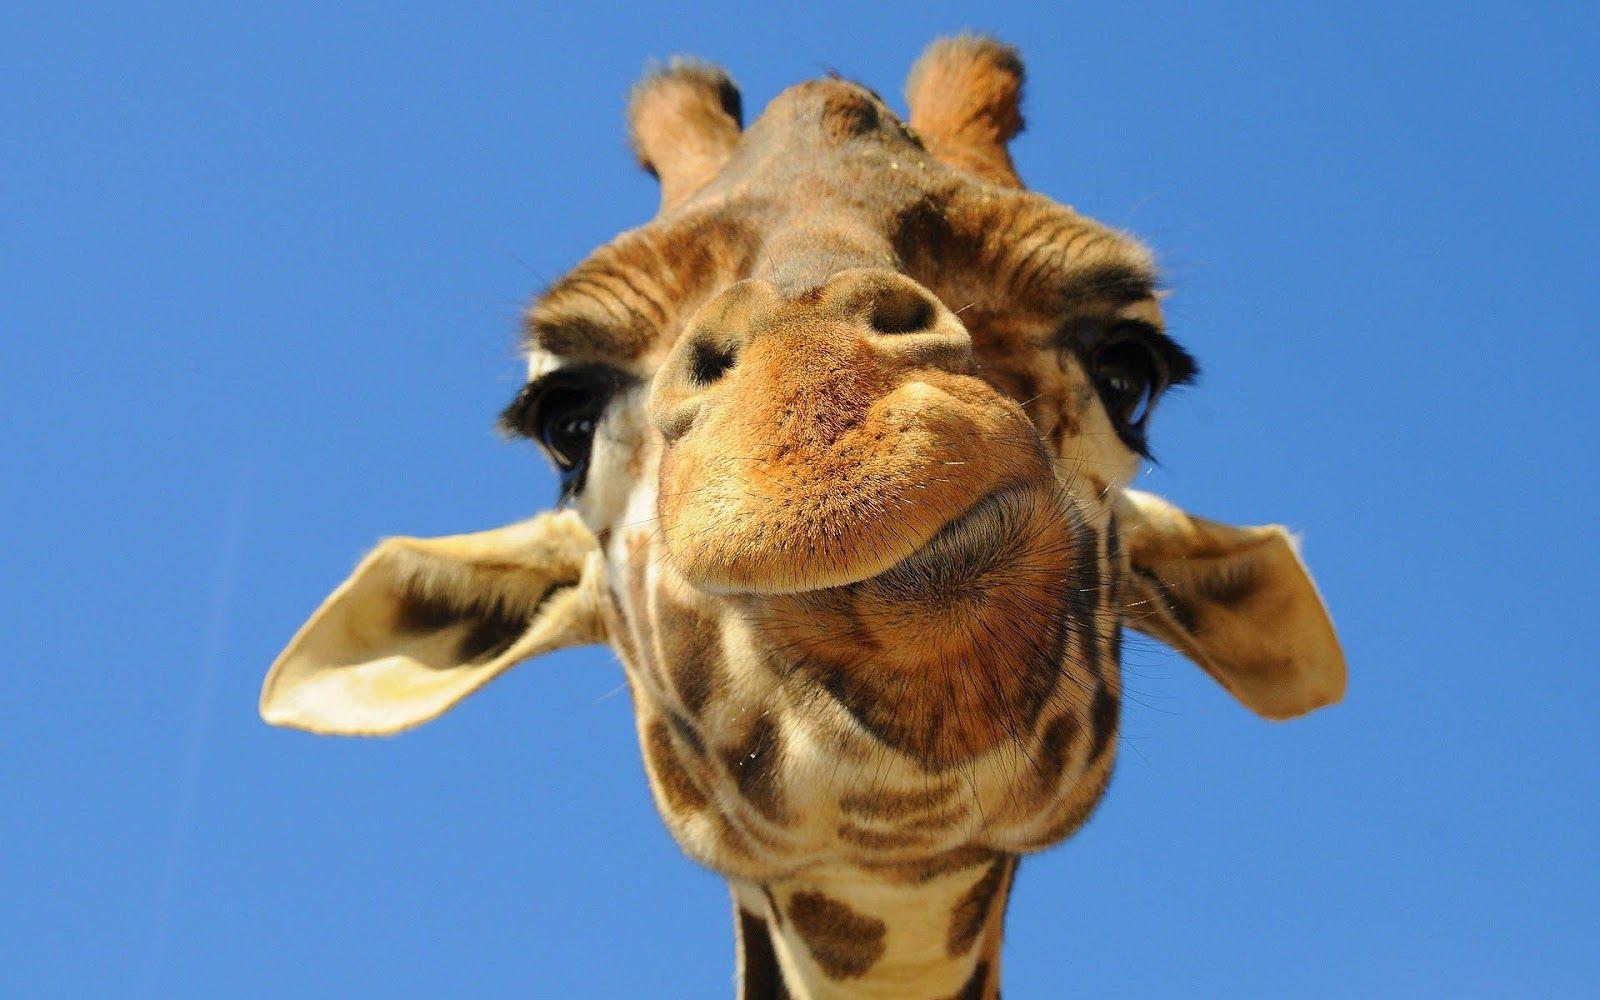 funny giraffe pictures portrait picture of a giraffe